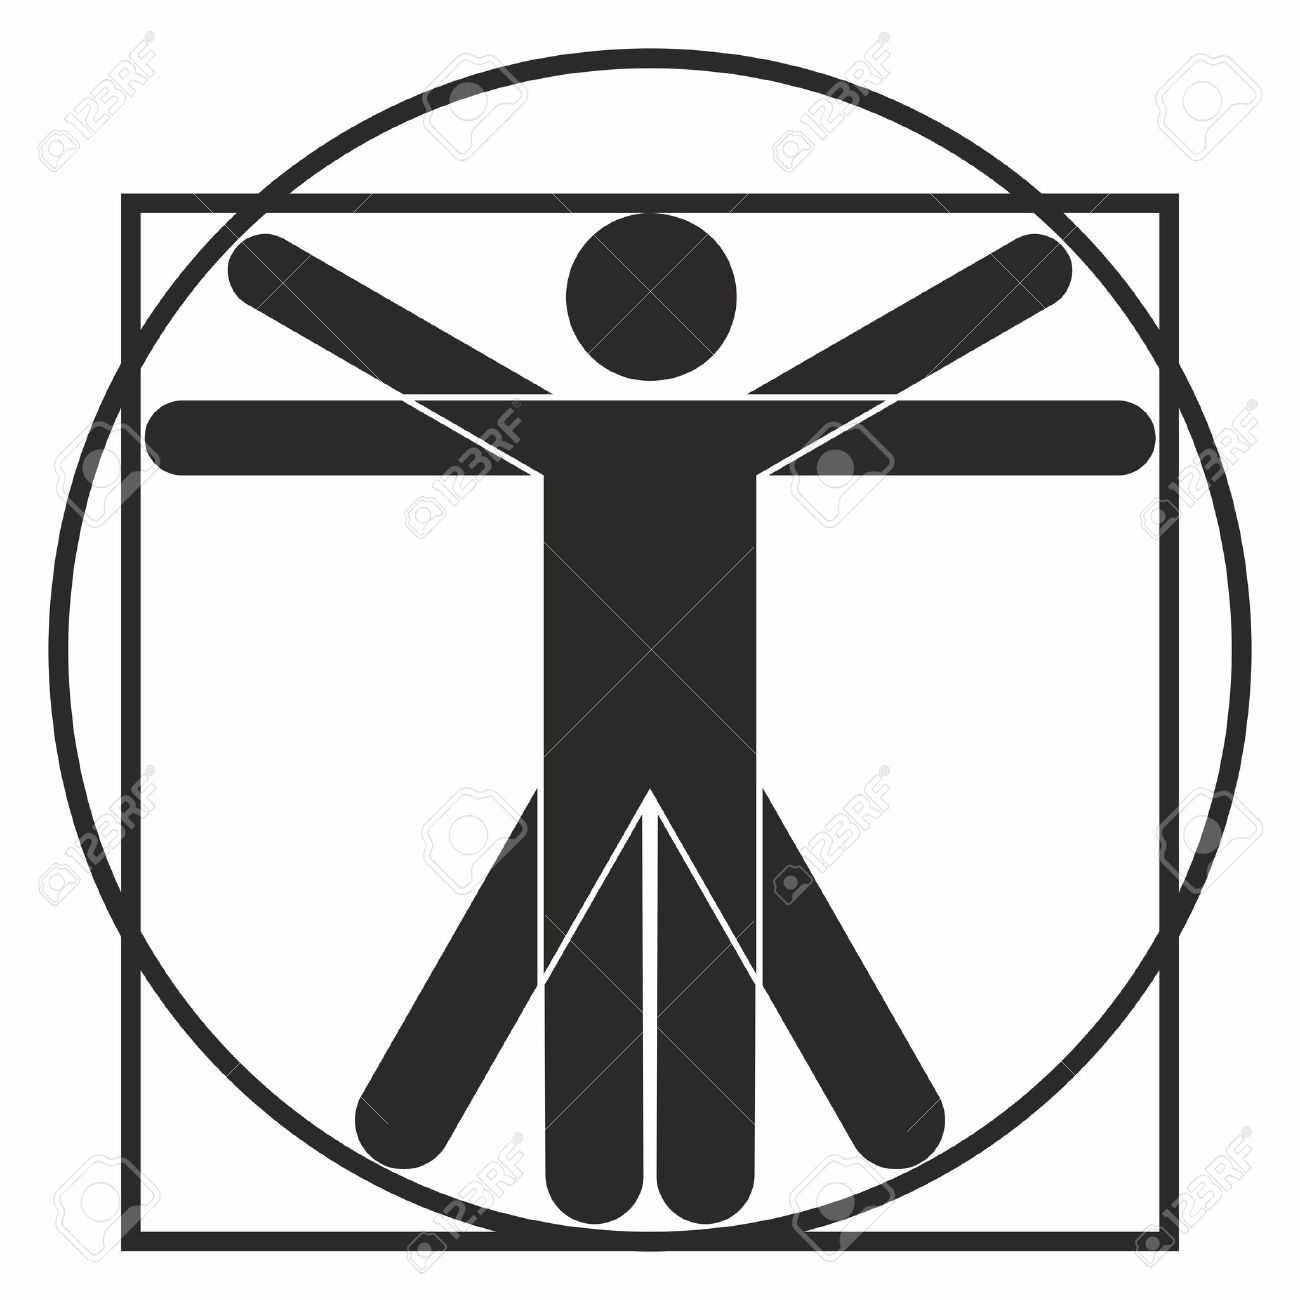 Vitruvian Man Icon Royalty Free Cliparts, Vectors, And Stock ...